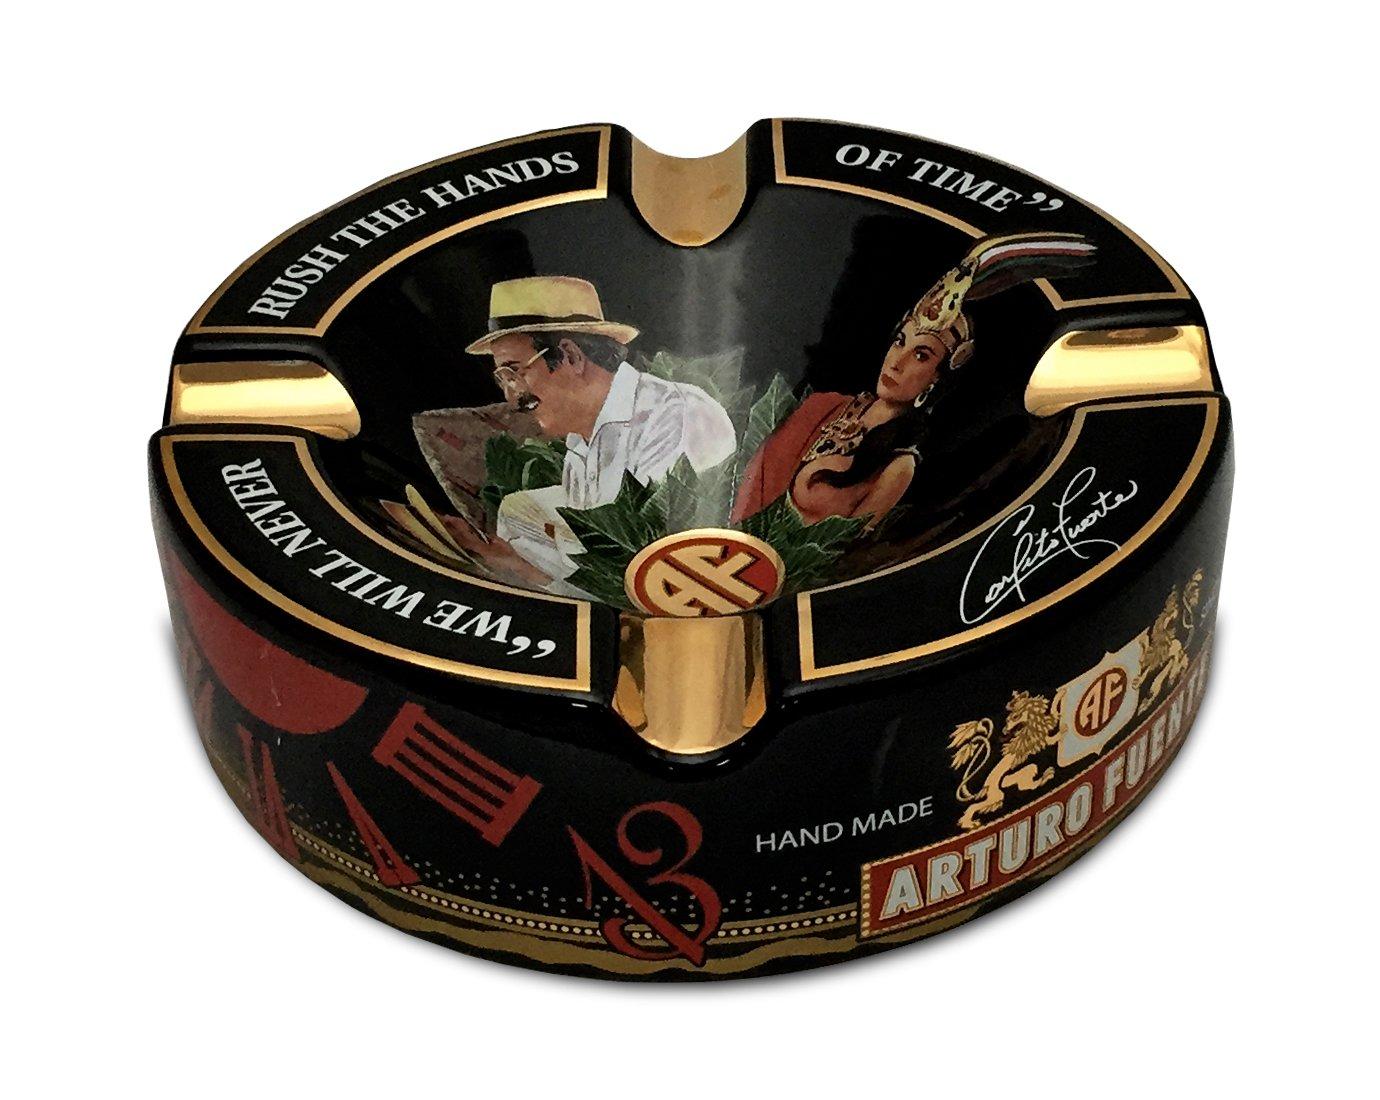 Limited Edition Large 8.75'' Arturo Fuente Porcelain Cigar Ashtray Black by Arturo Fuente